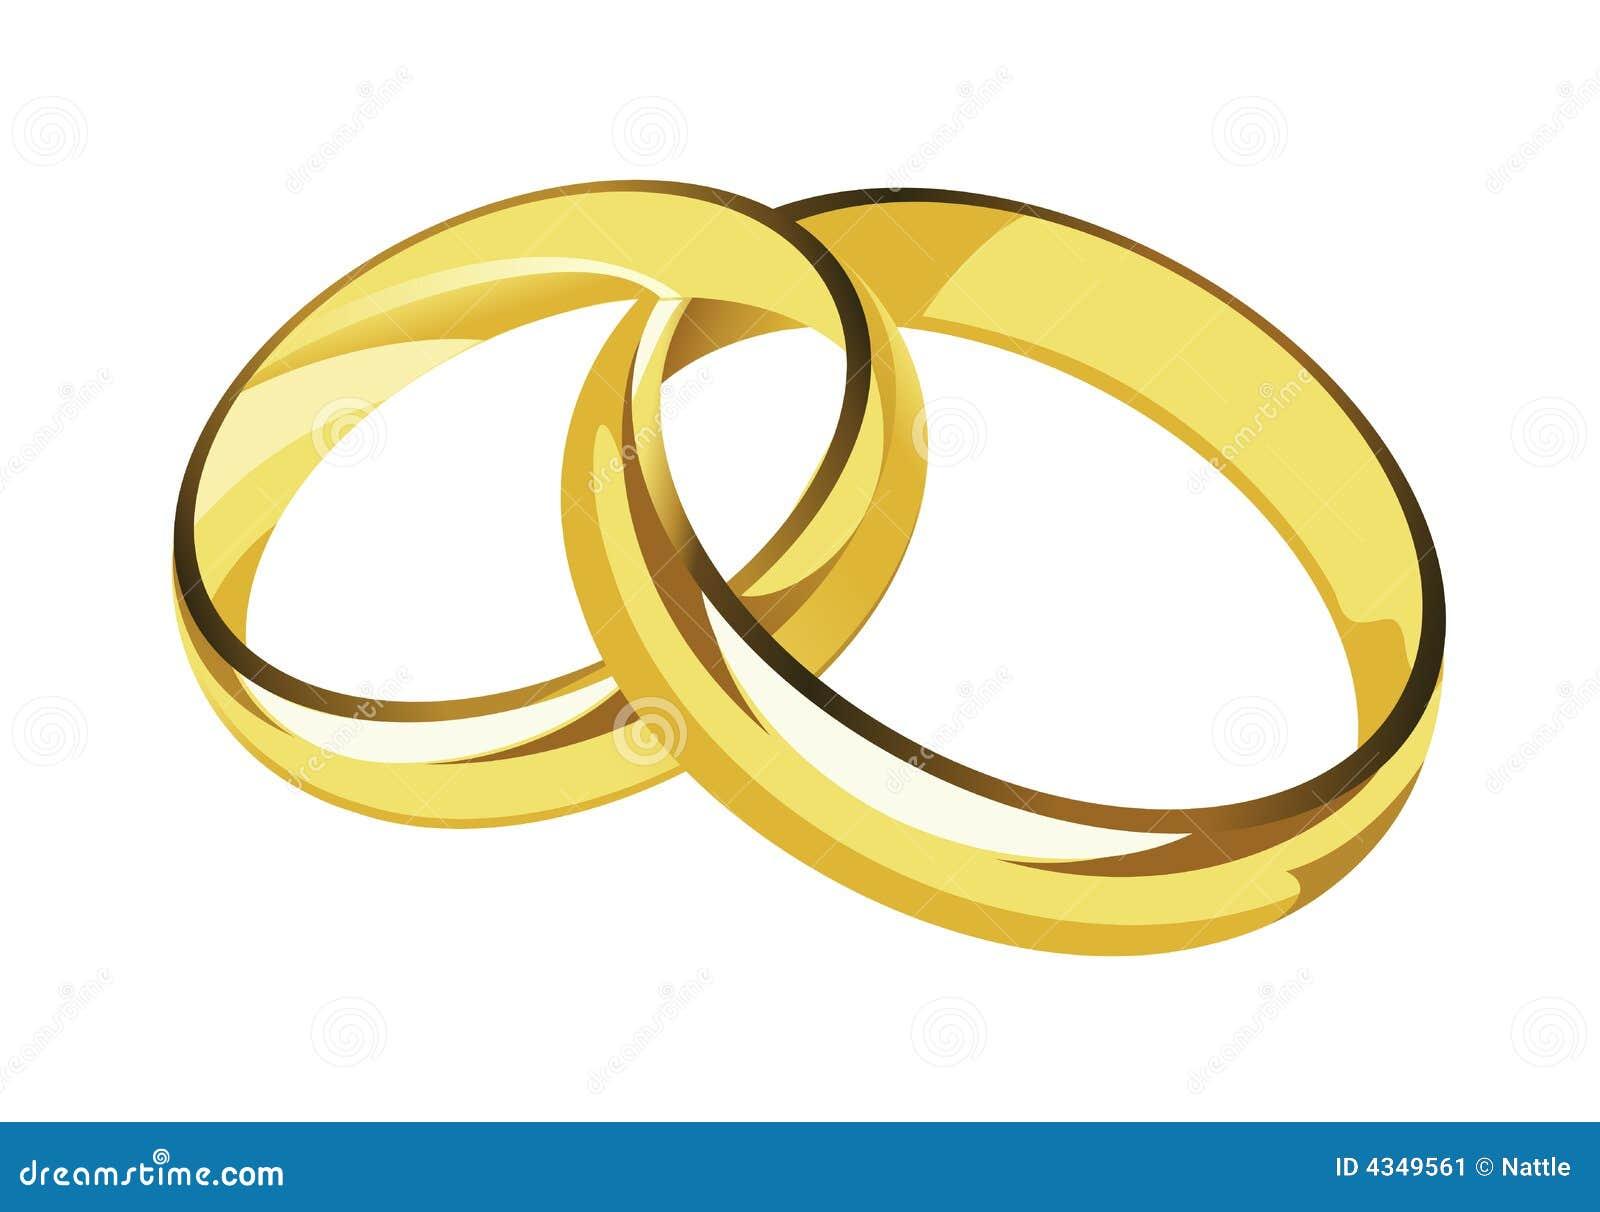 Image Result For White Gold Wedding Rings